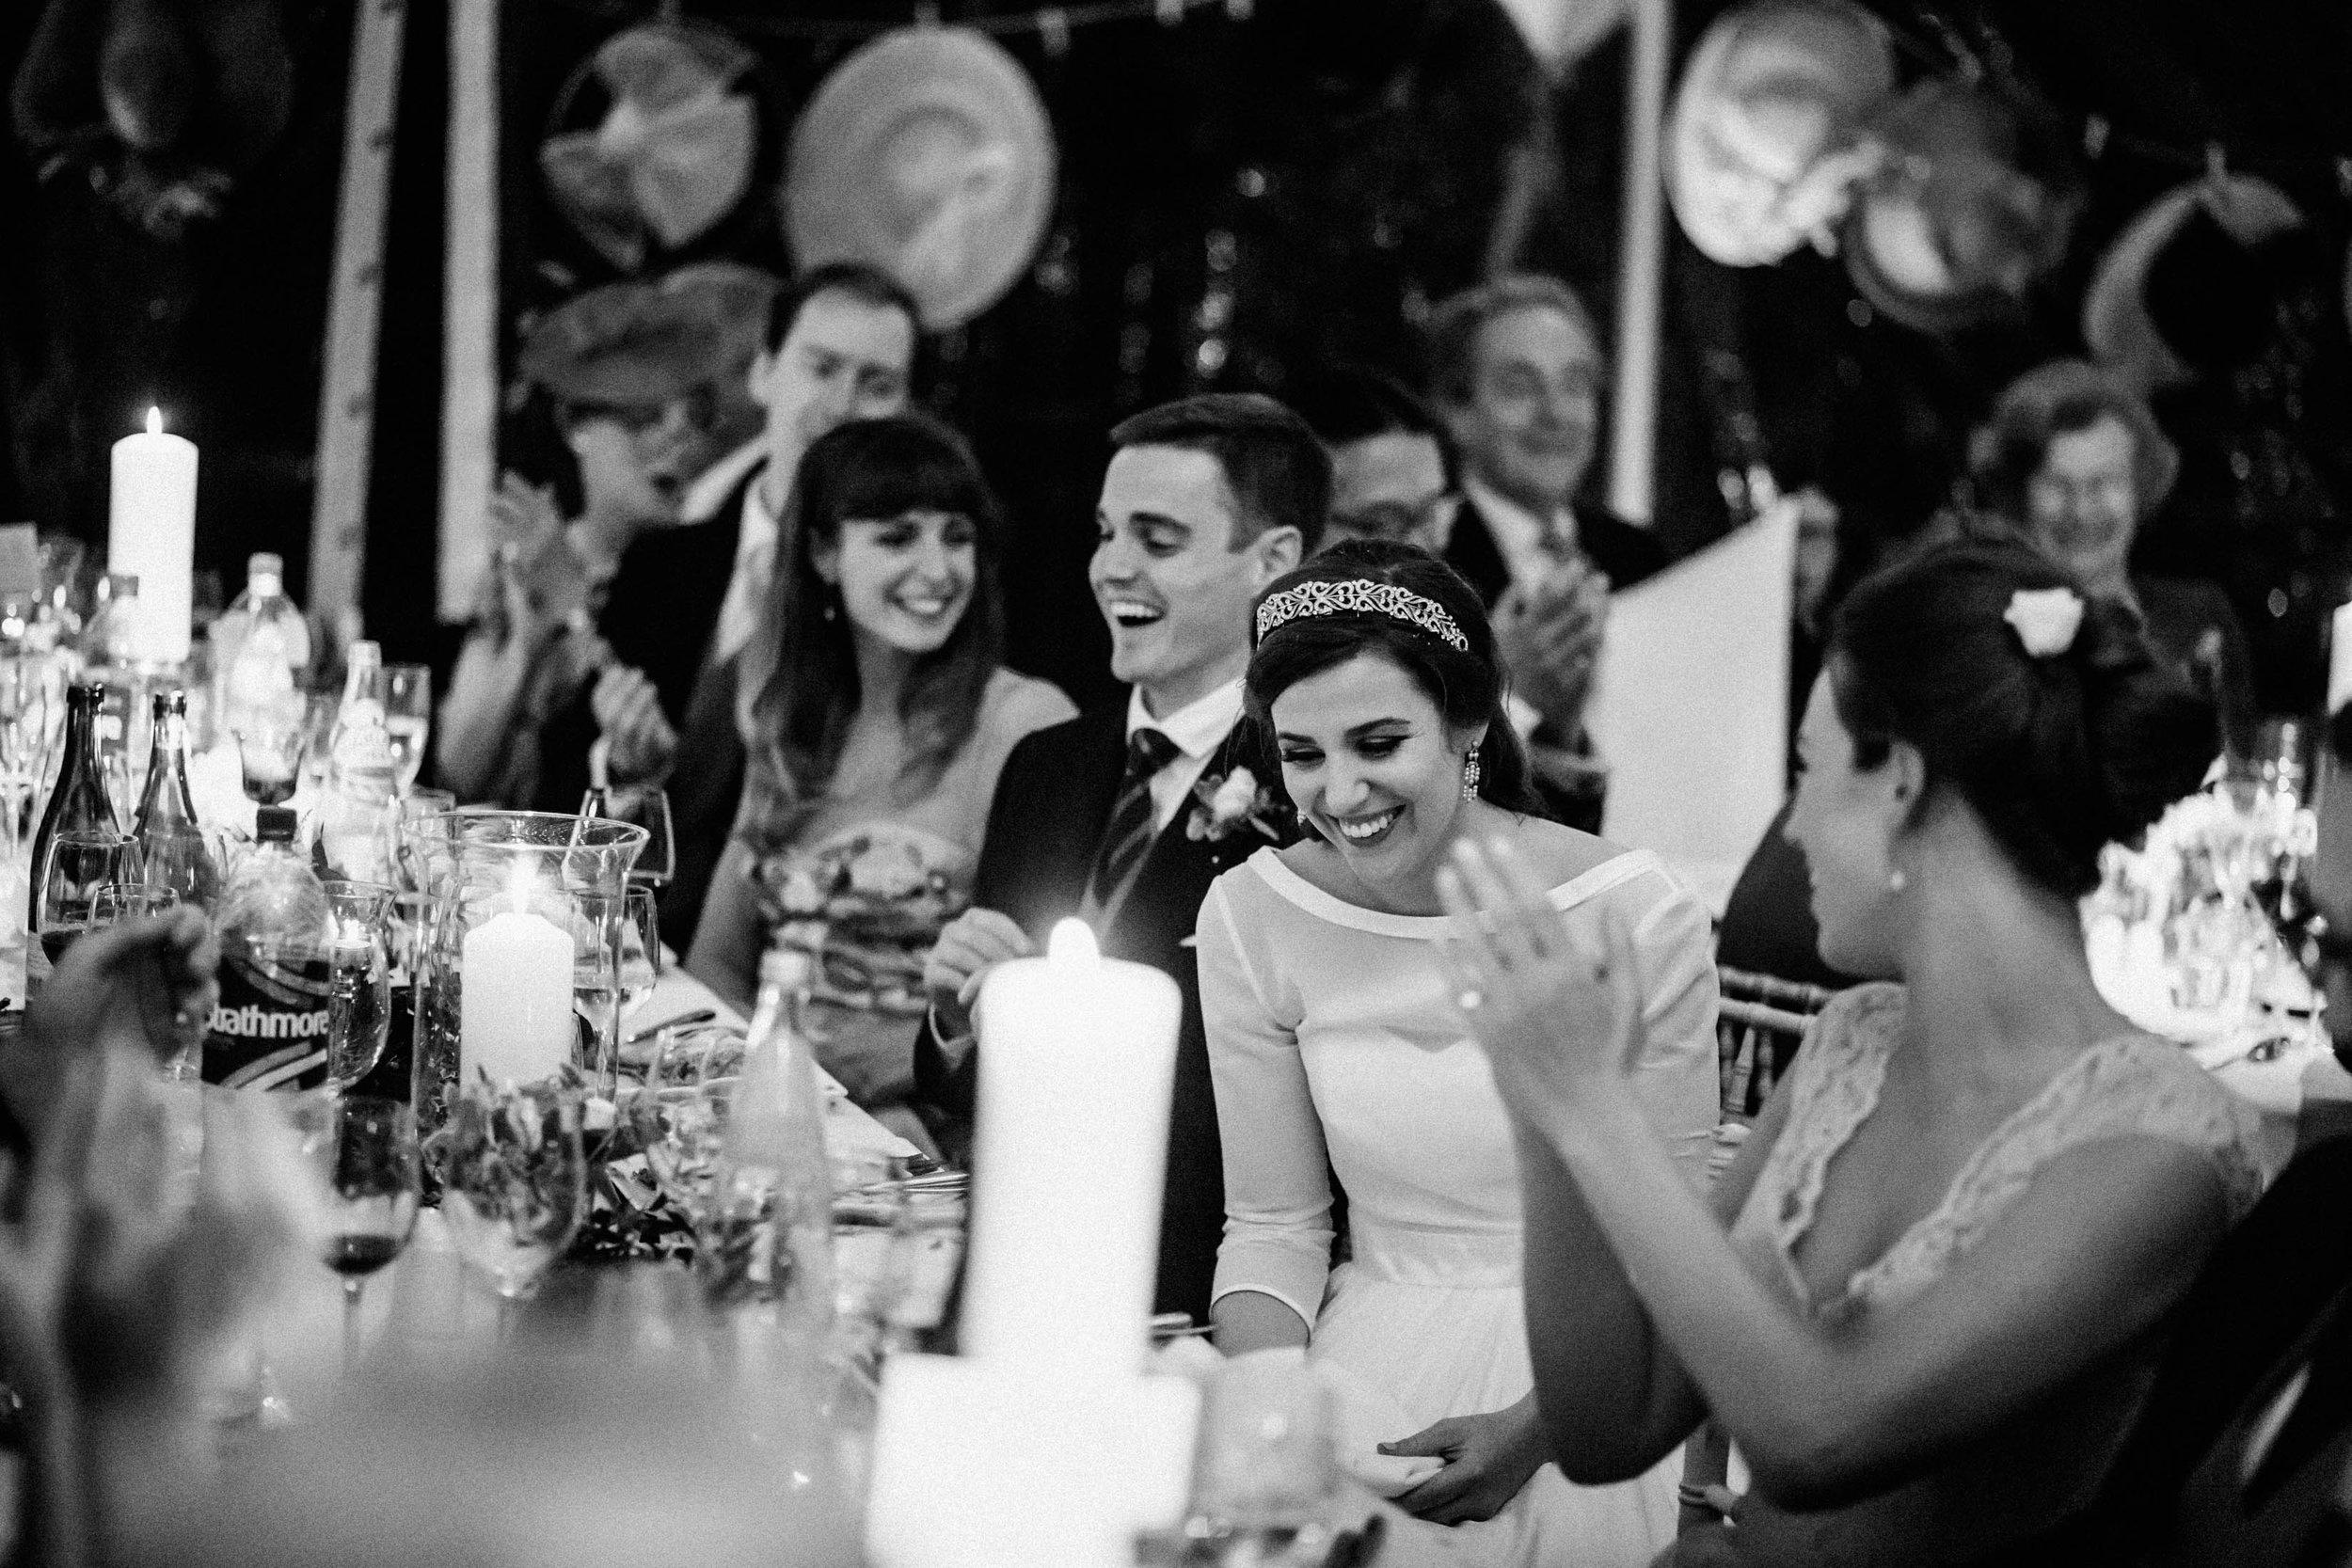 oxford_wedding_photographer-103.jpg